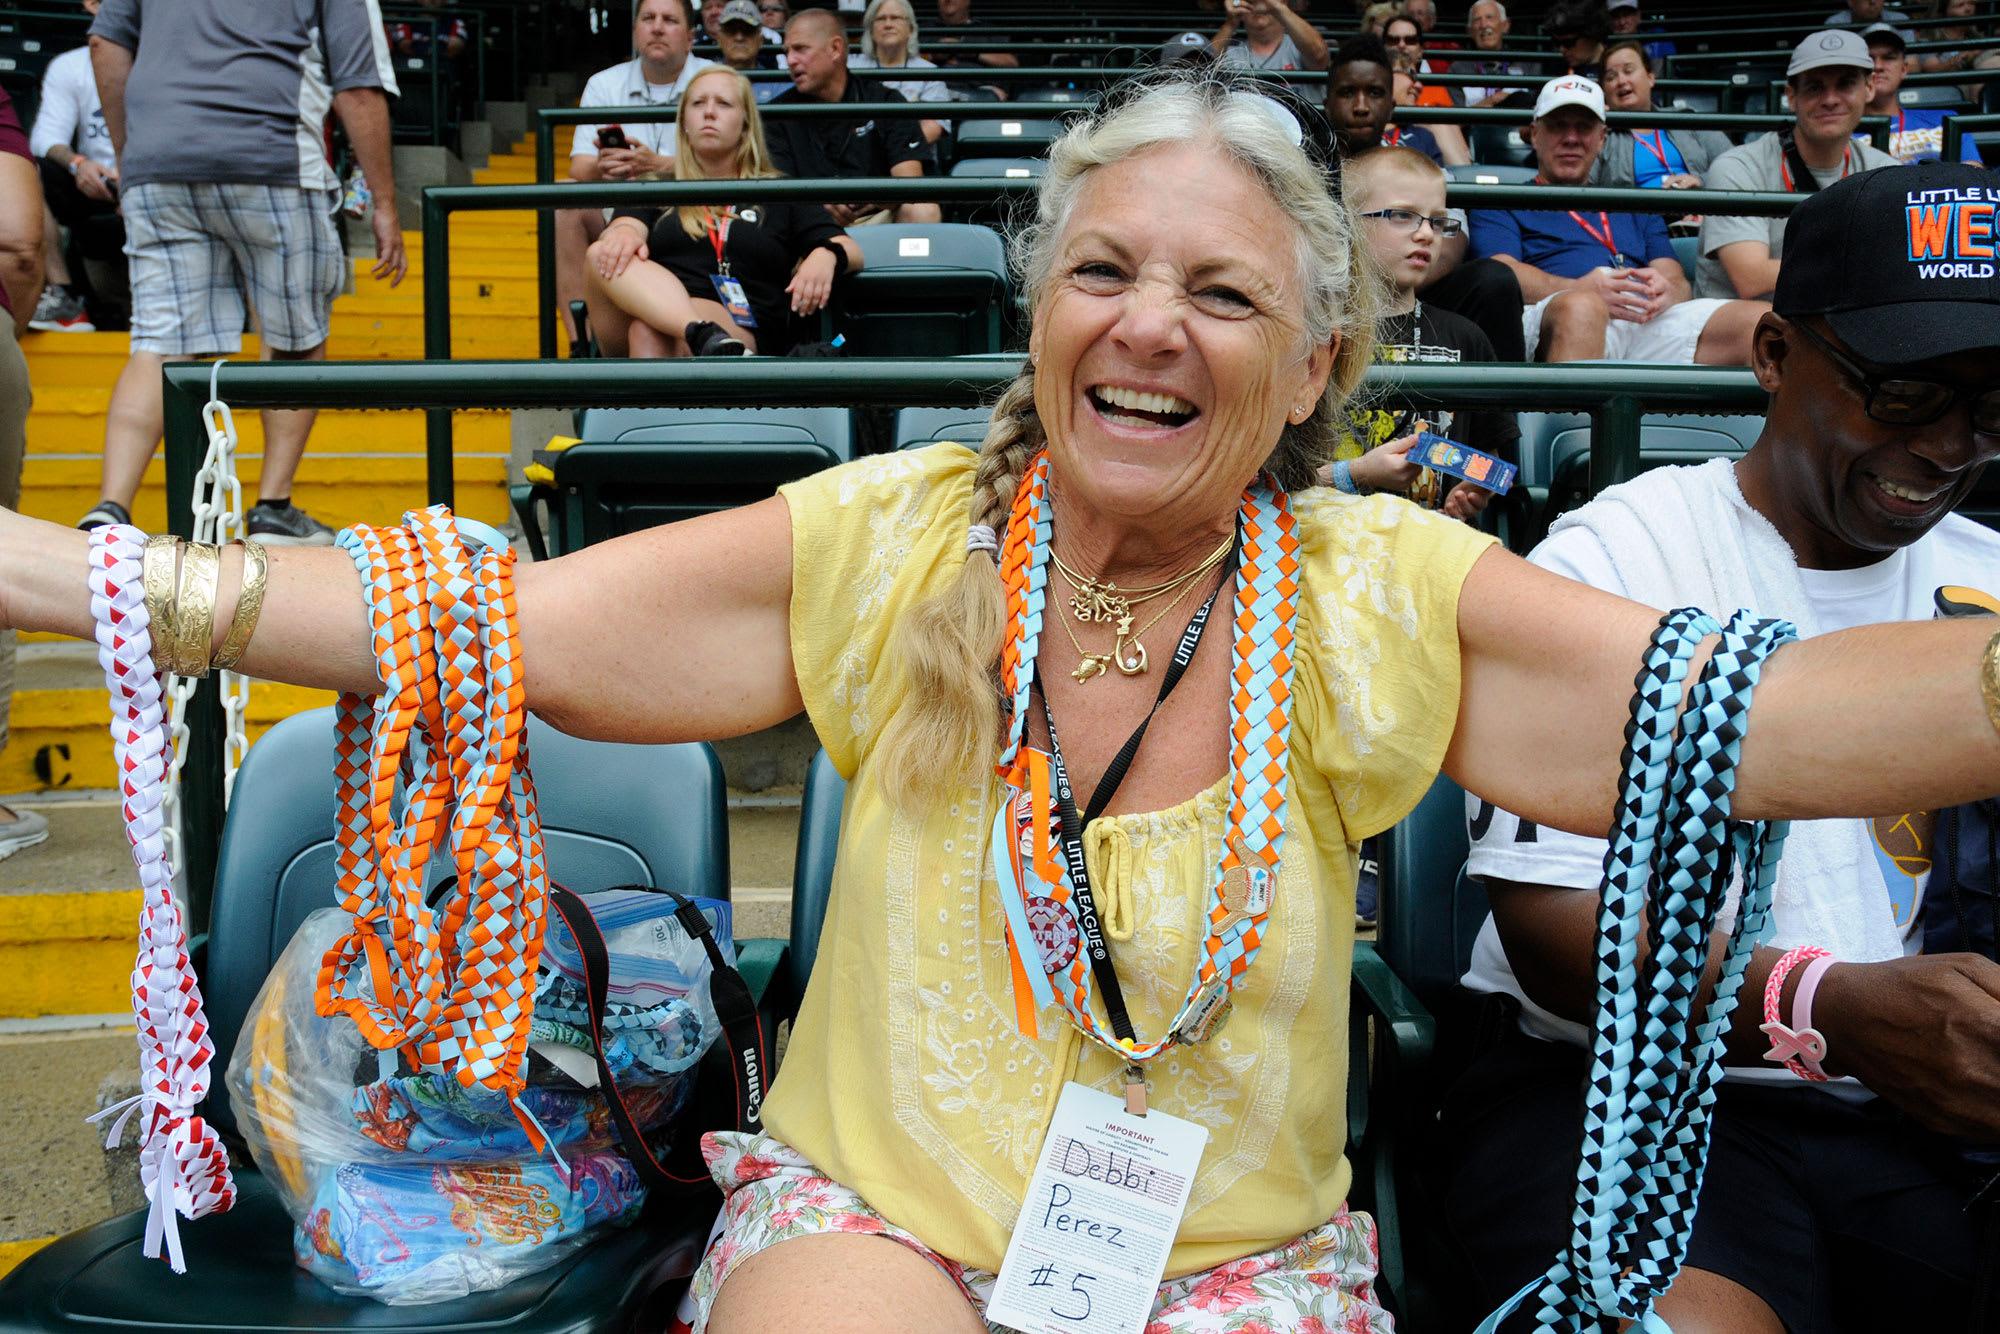 Hawaiian lei maker Debbie Perez